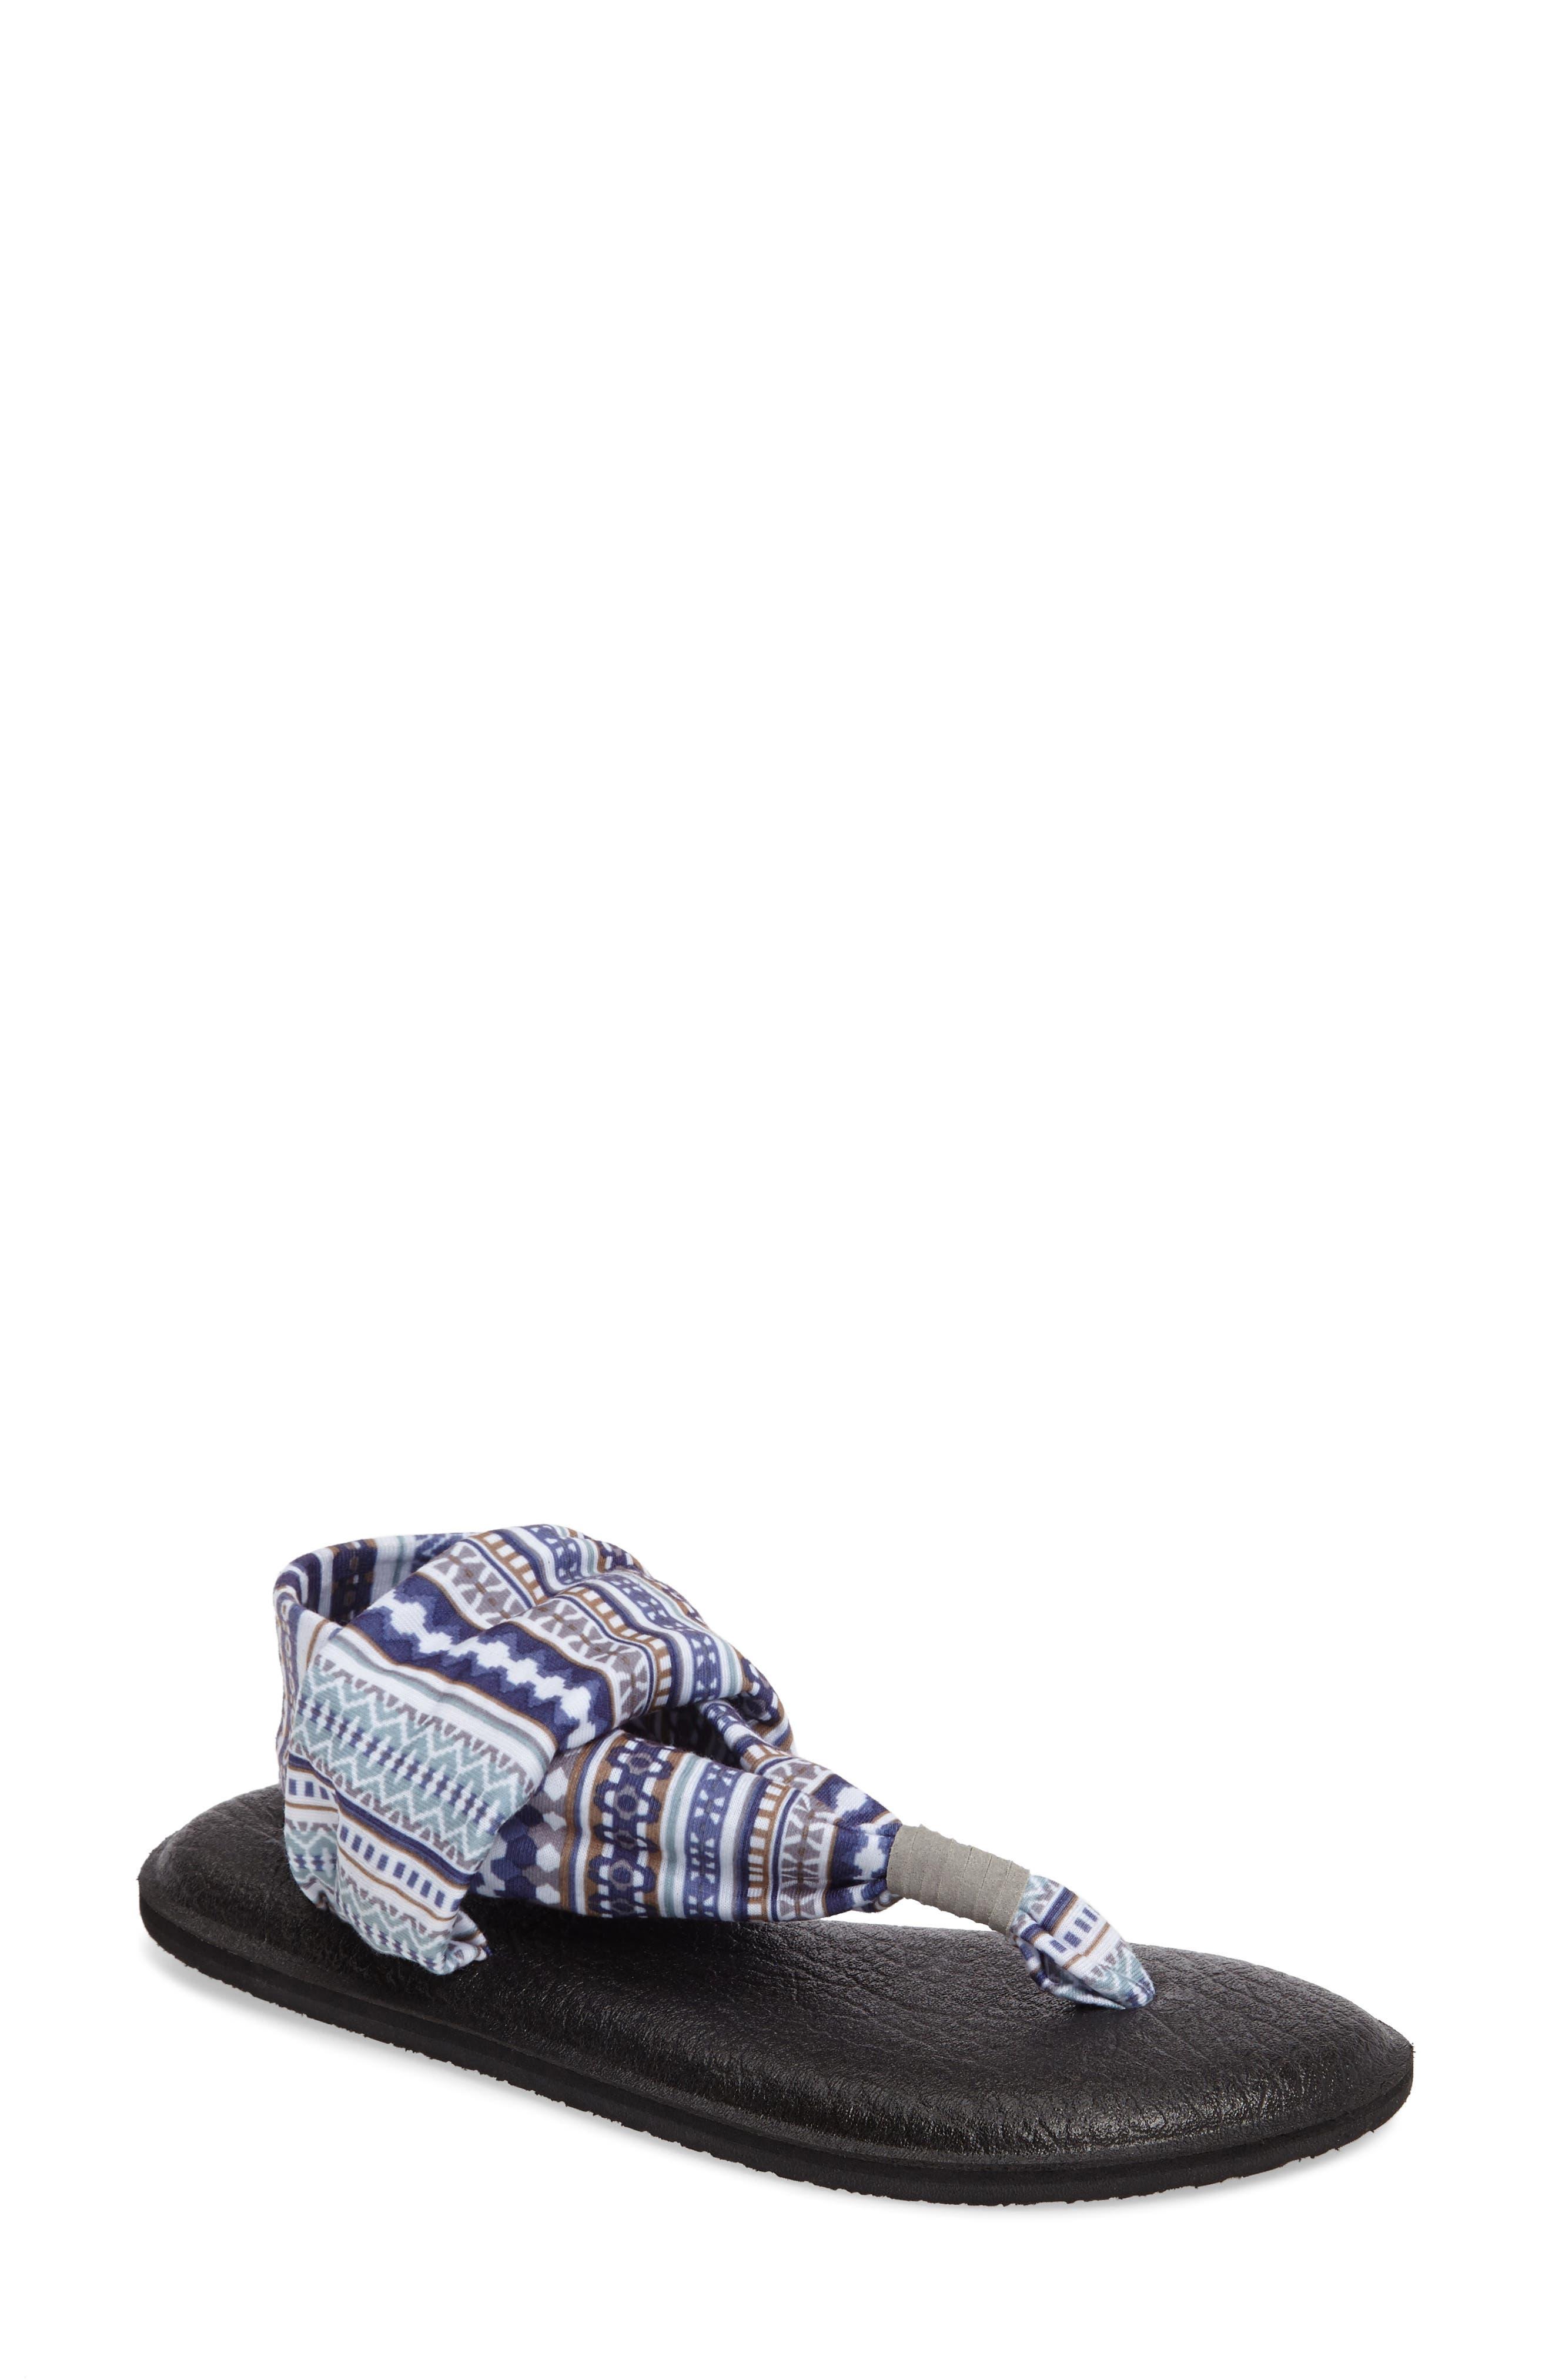 'Yoga Sling 2' Sandal,                             Main thumbnail 16, color,